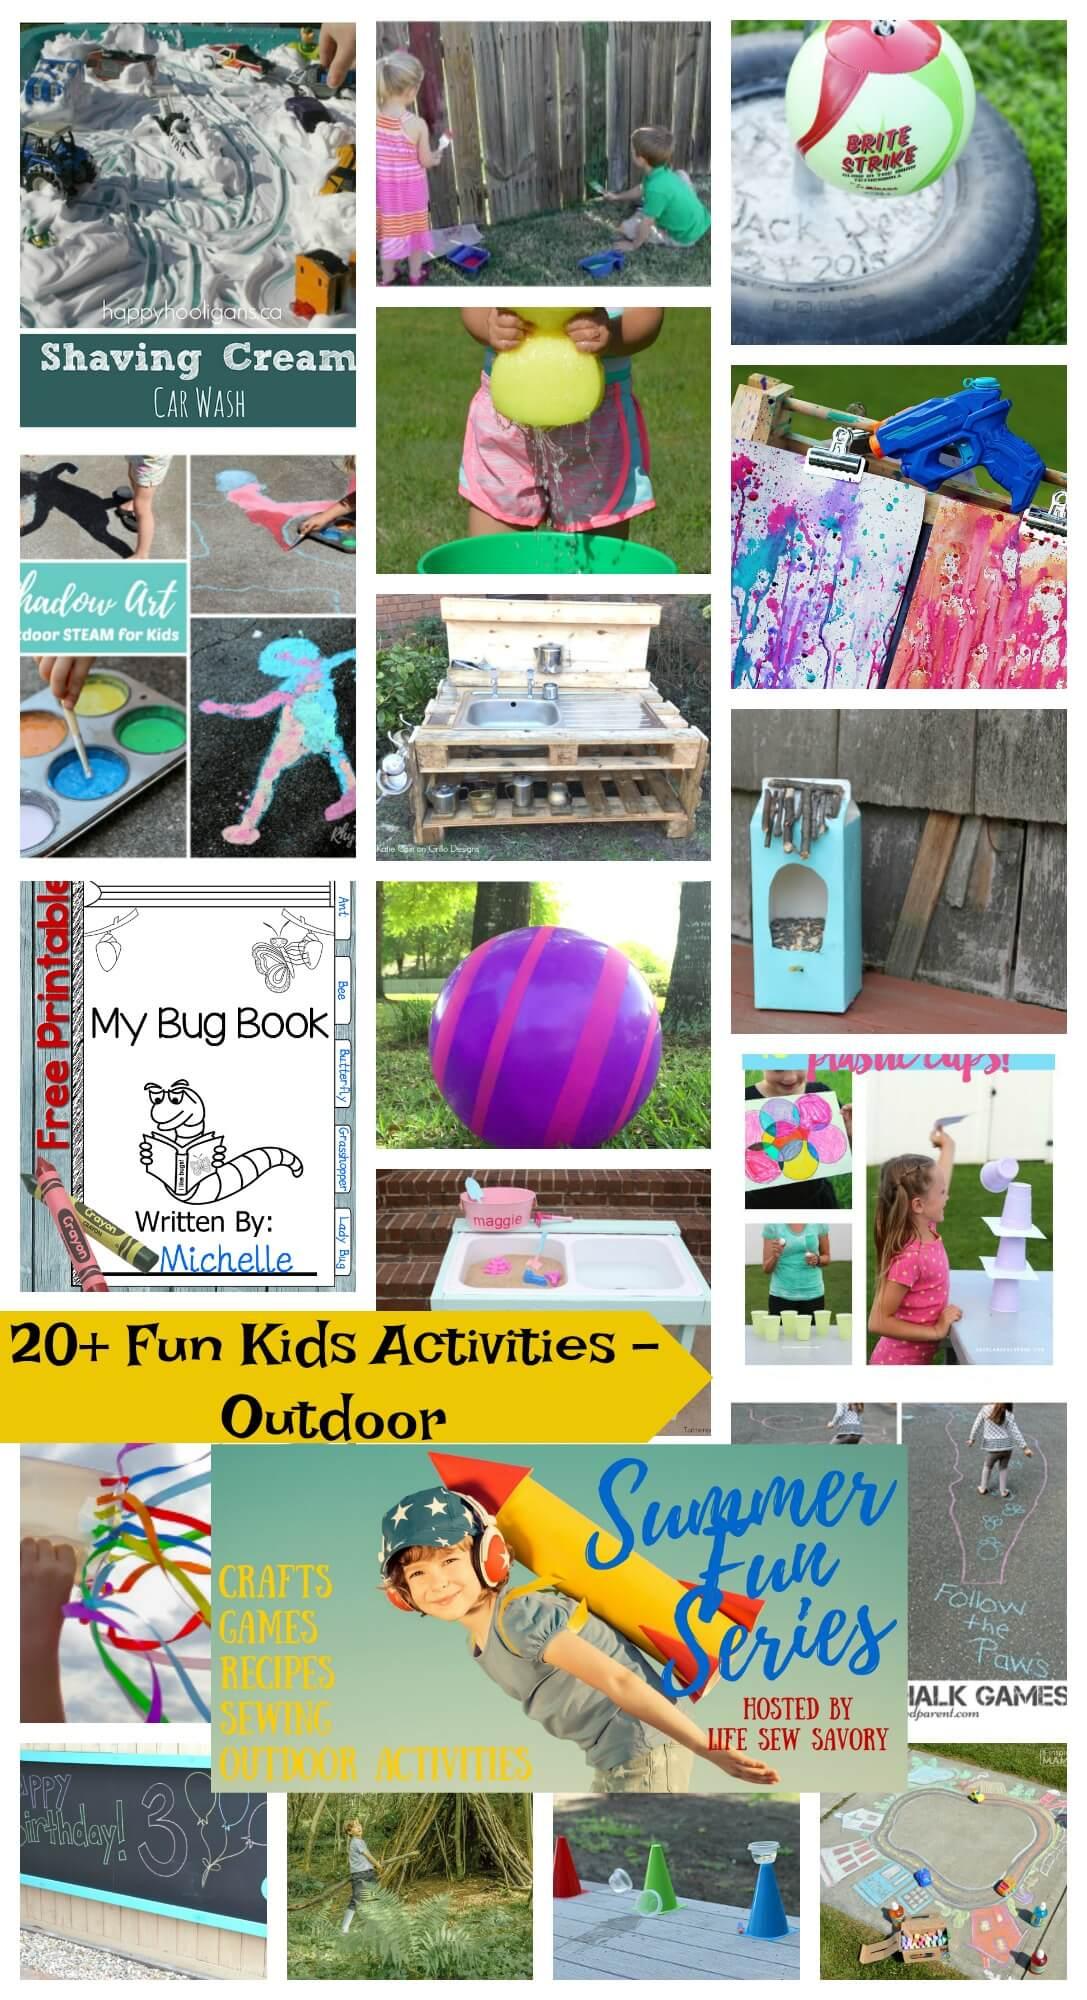 Fun Kids Activities - Outdoor fun from Life Sew Savory Summer Fun Series